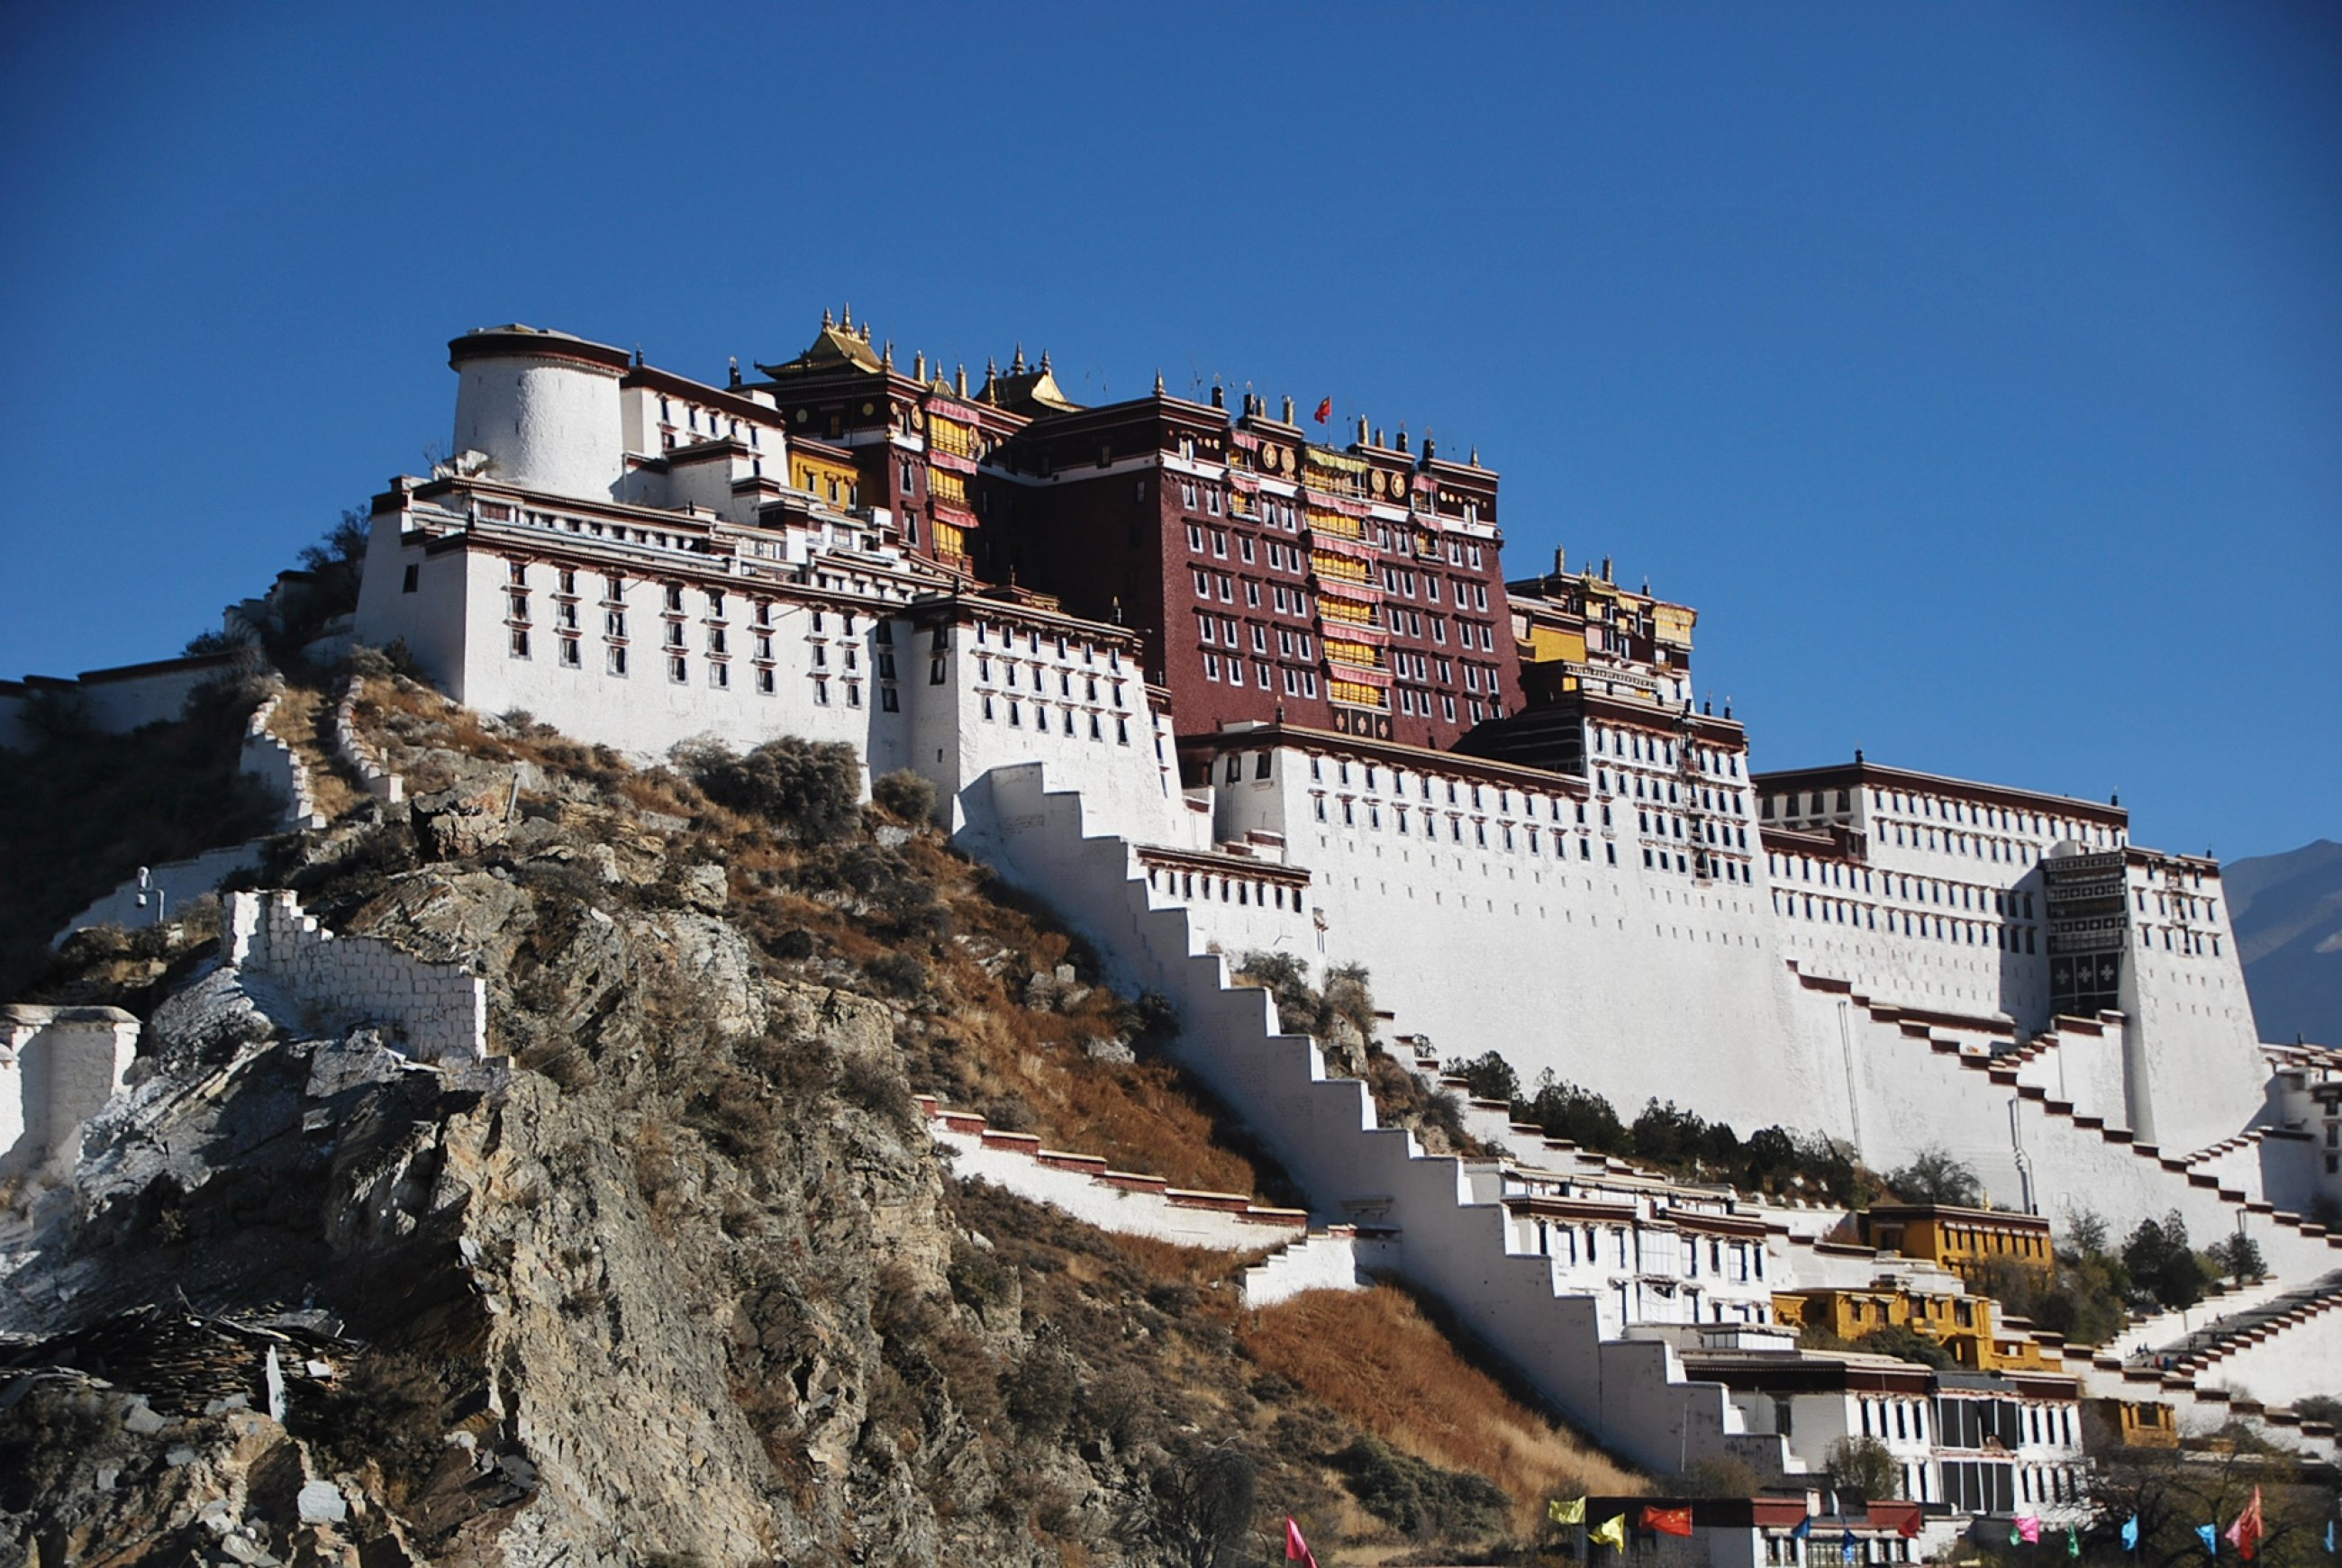 https://bubo.sk/uploads/galleries/16317/tibet-potala-ctni-11-2014-mirka-sulka-157-.jpg